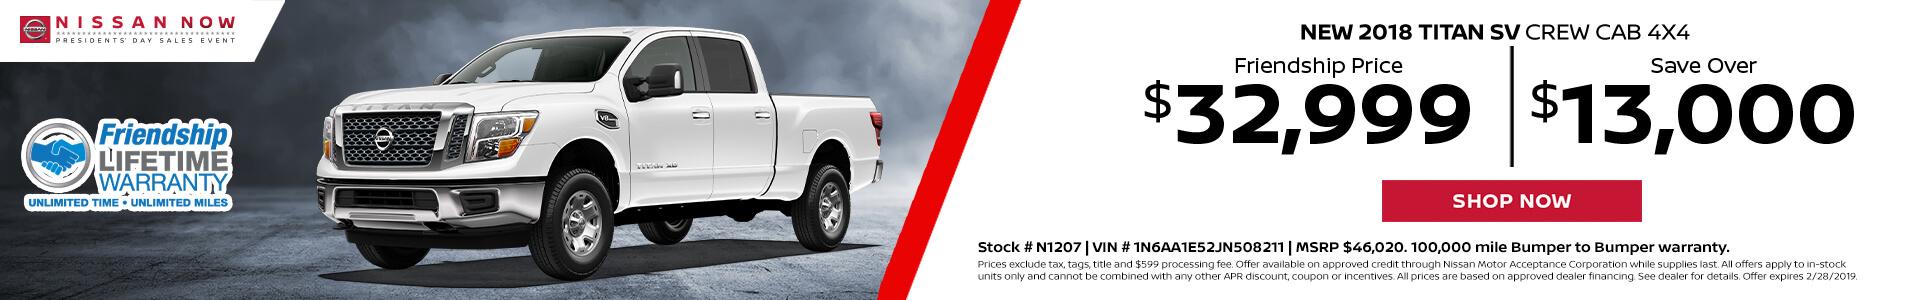 Nissan Titan $34,018 Purchase